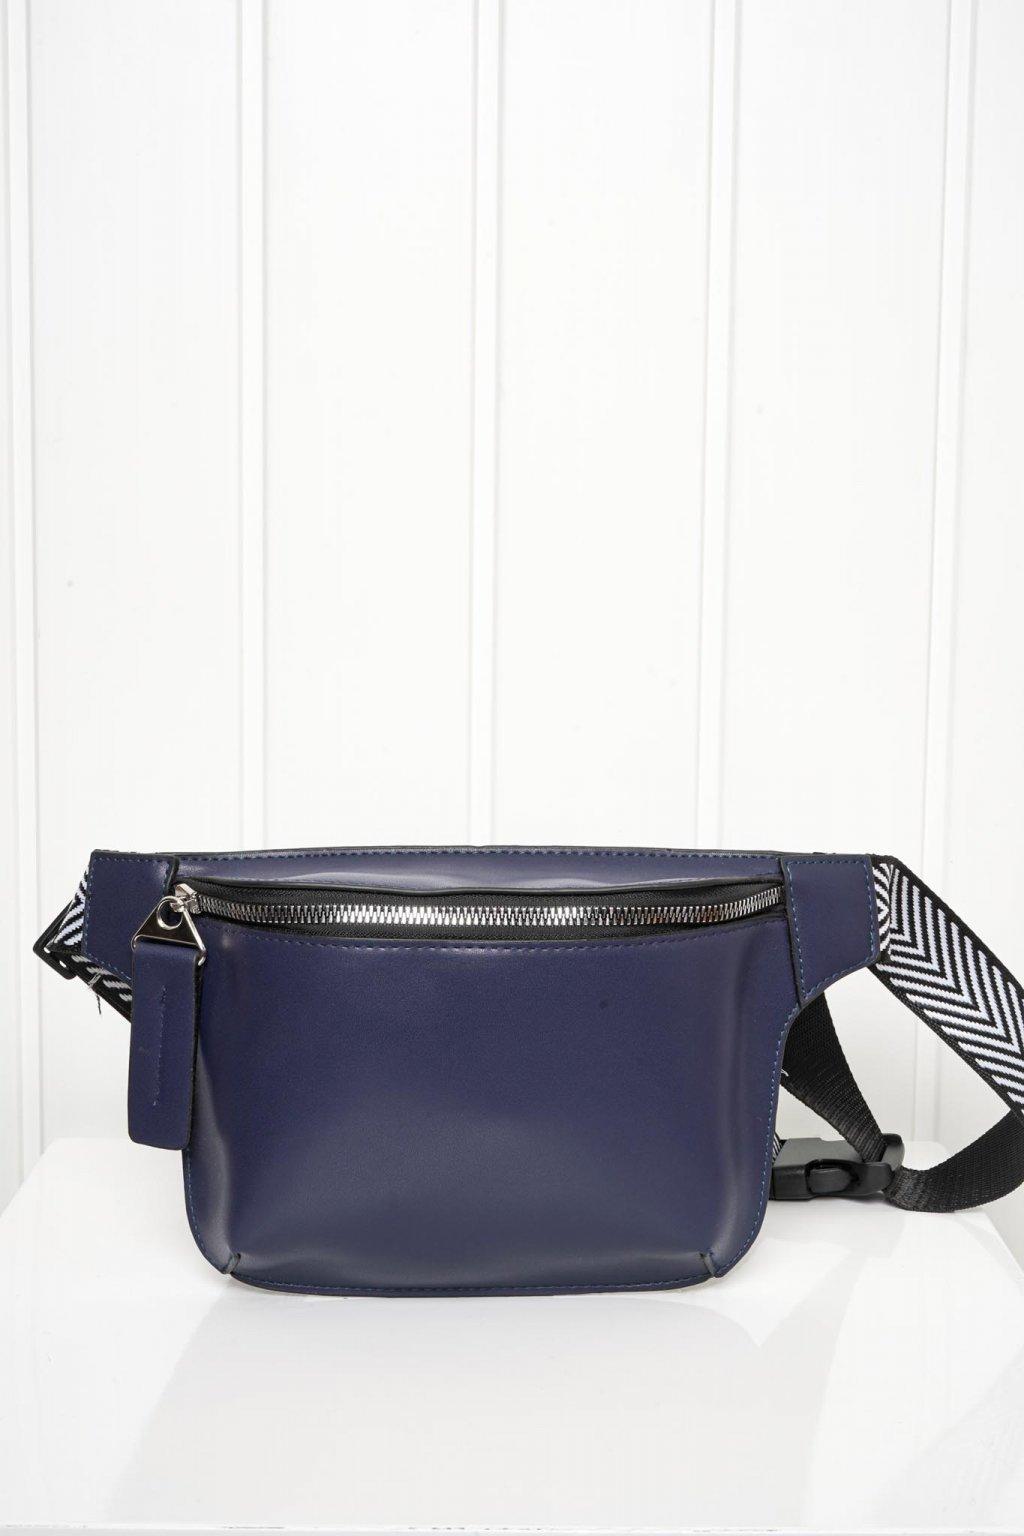 Kabelka, crossbody, ruksak, shopping bag, shopperka, 348